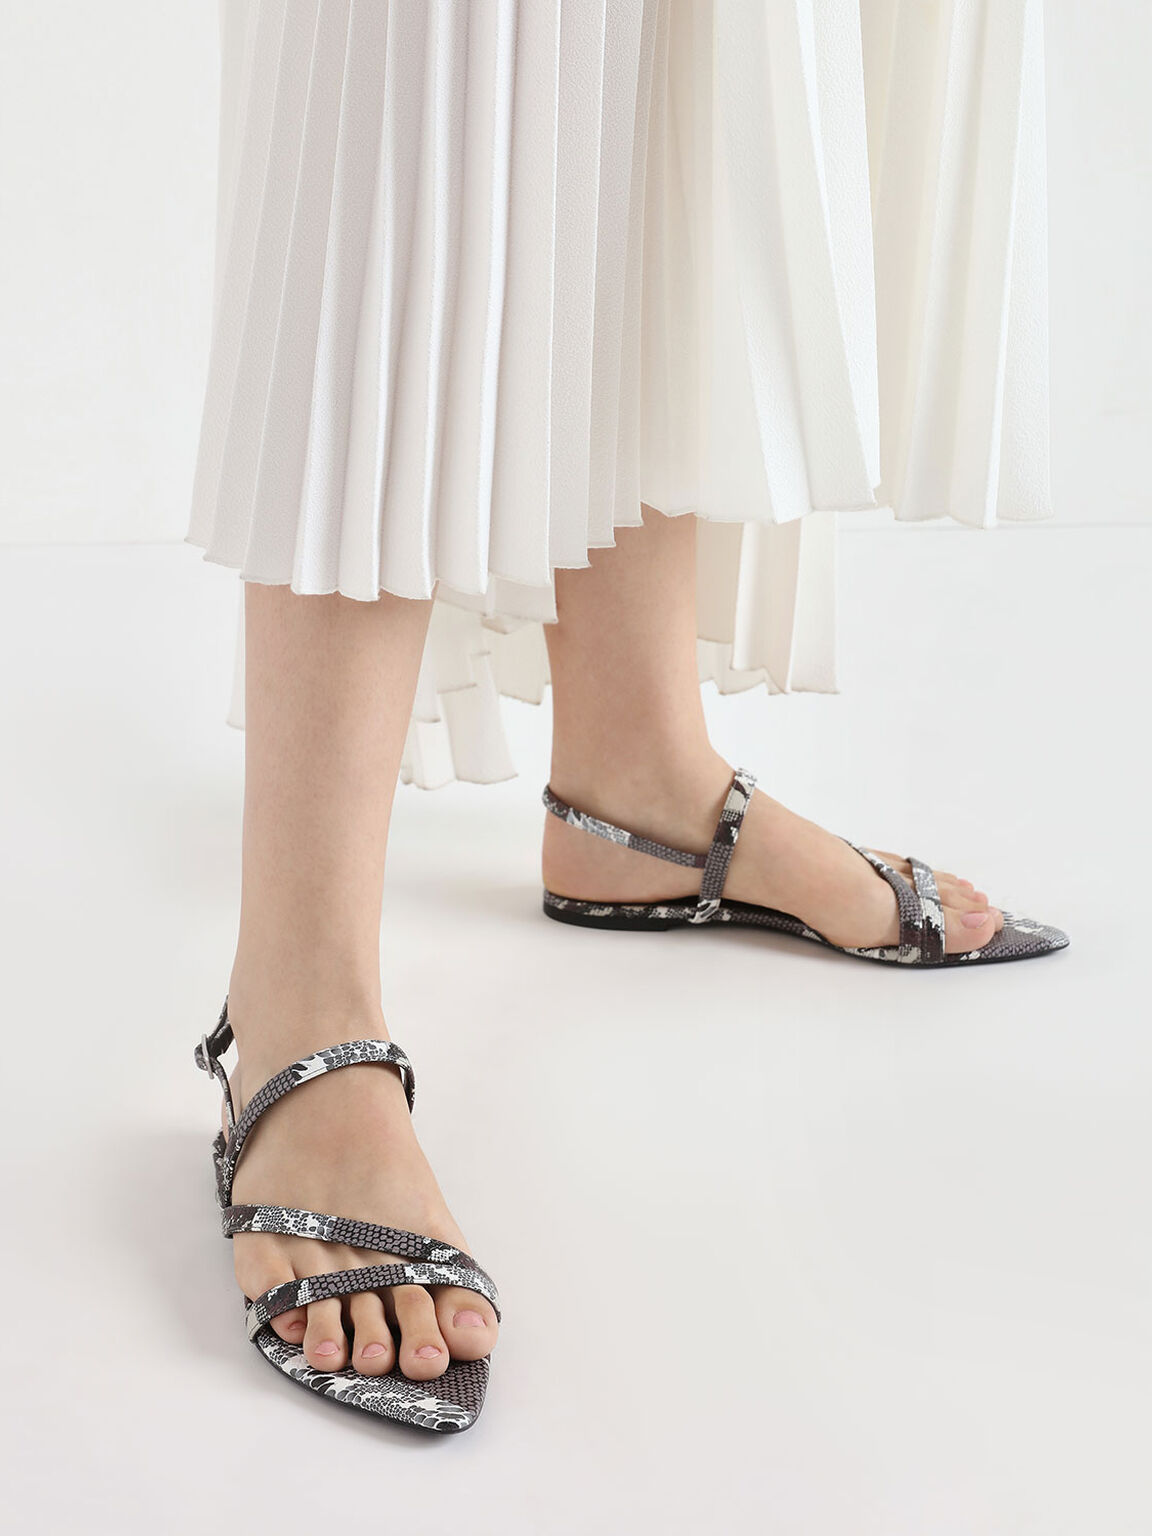 Asymmetric Snake Print Strappy Sandals, Multi, hi-res